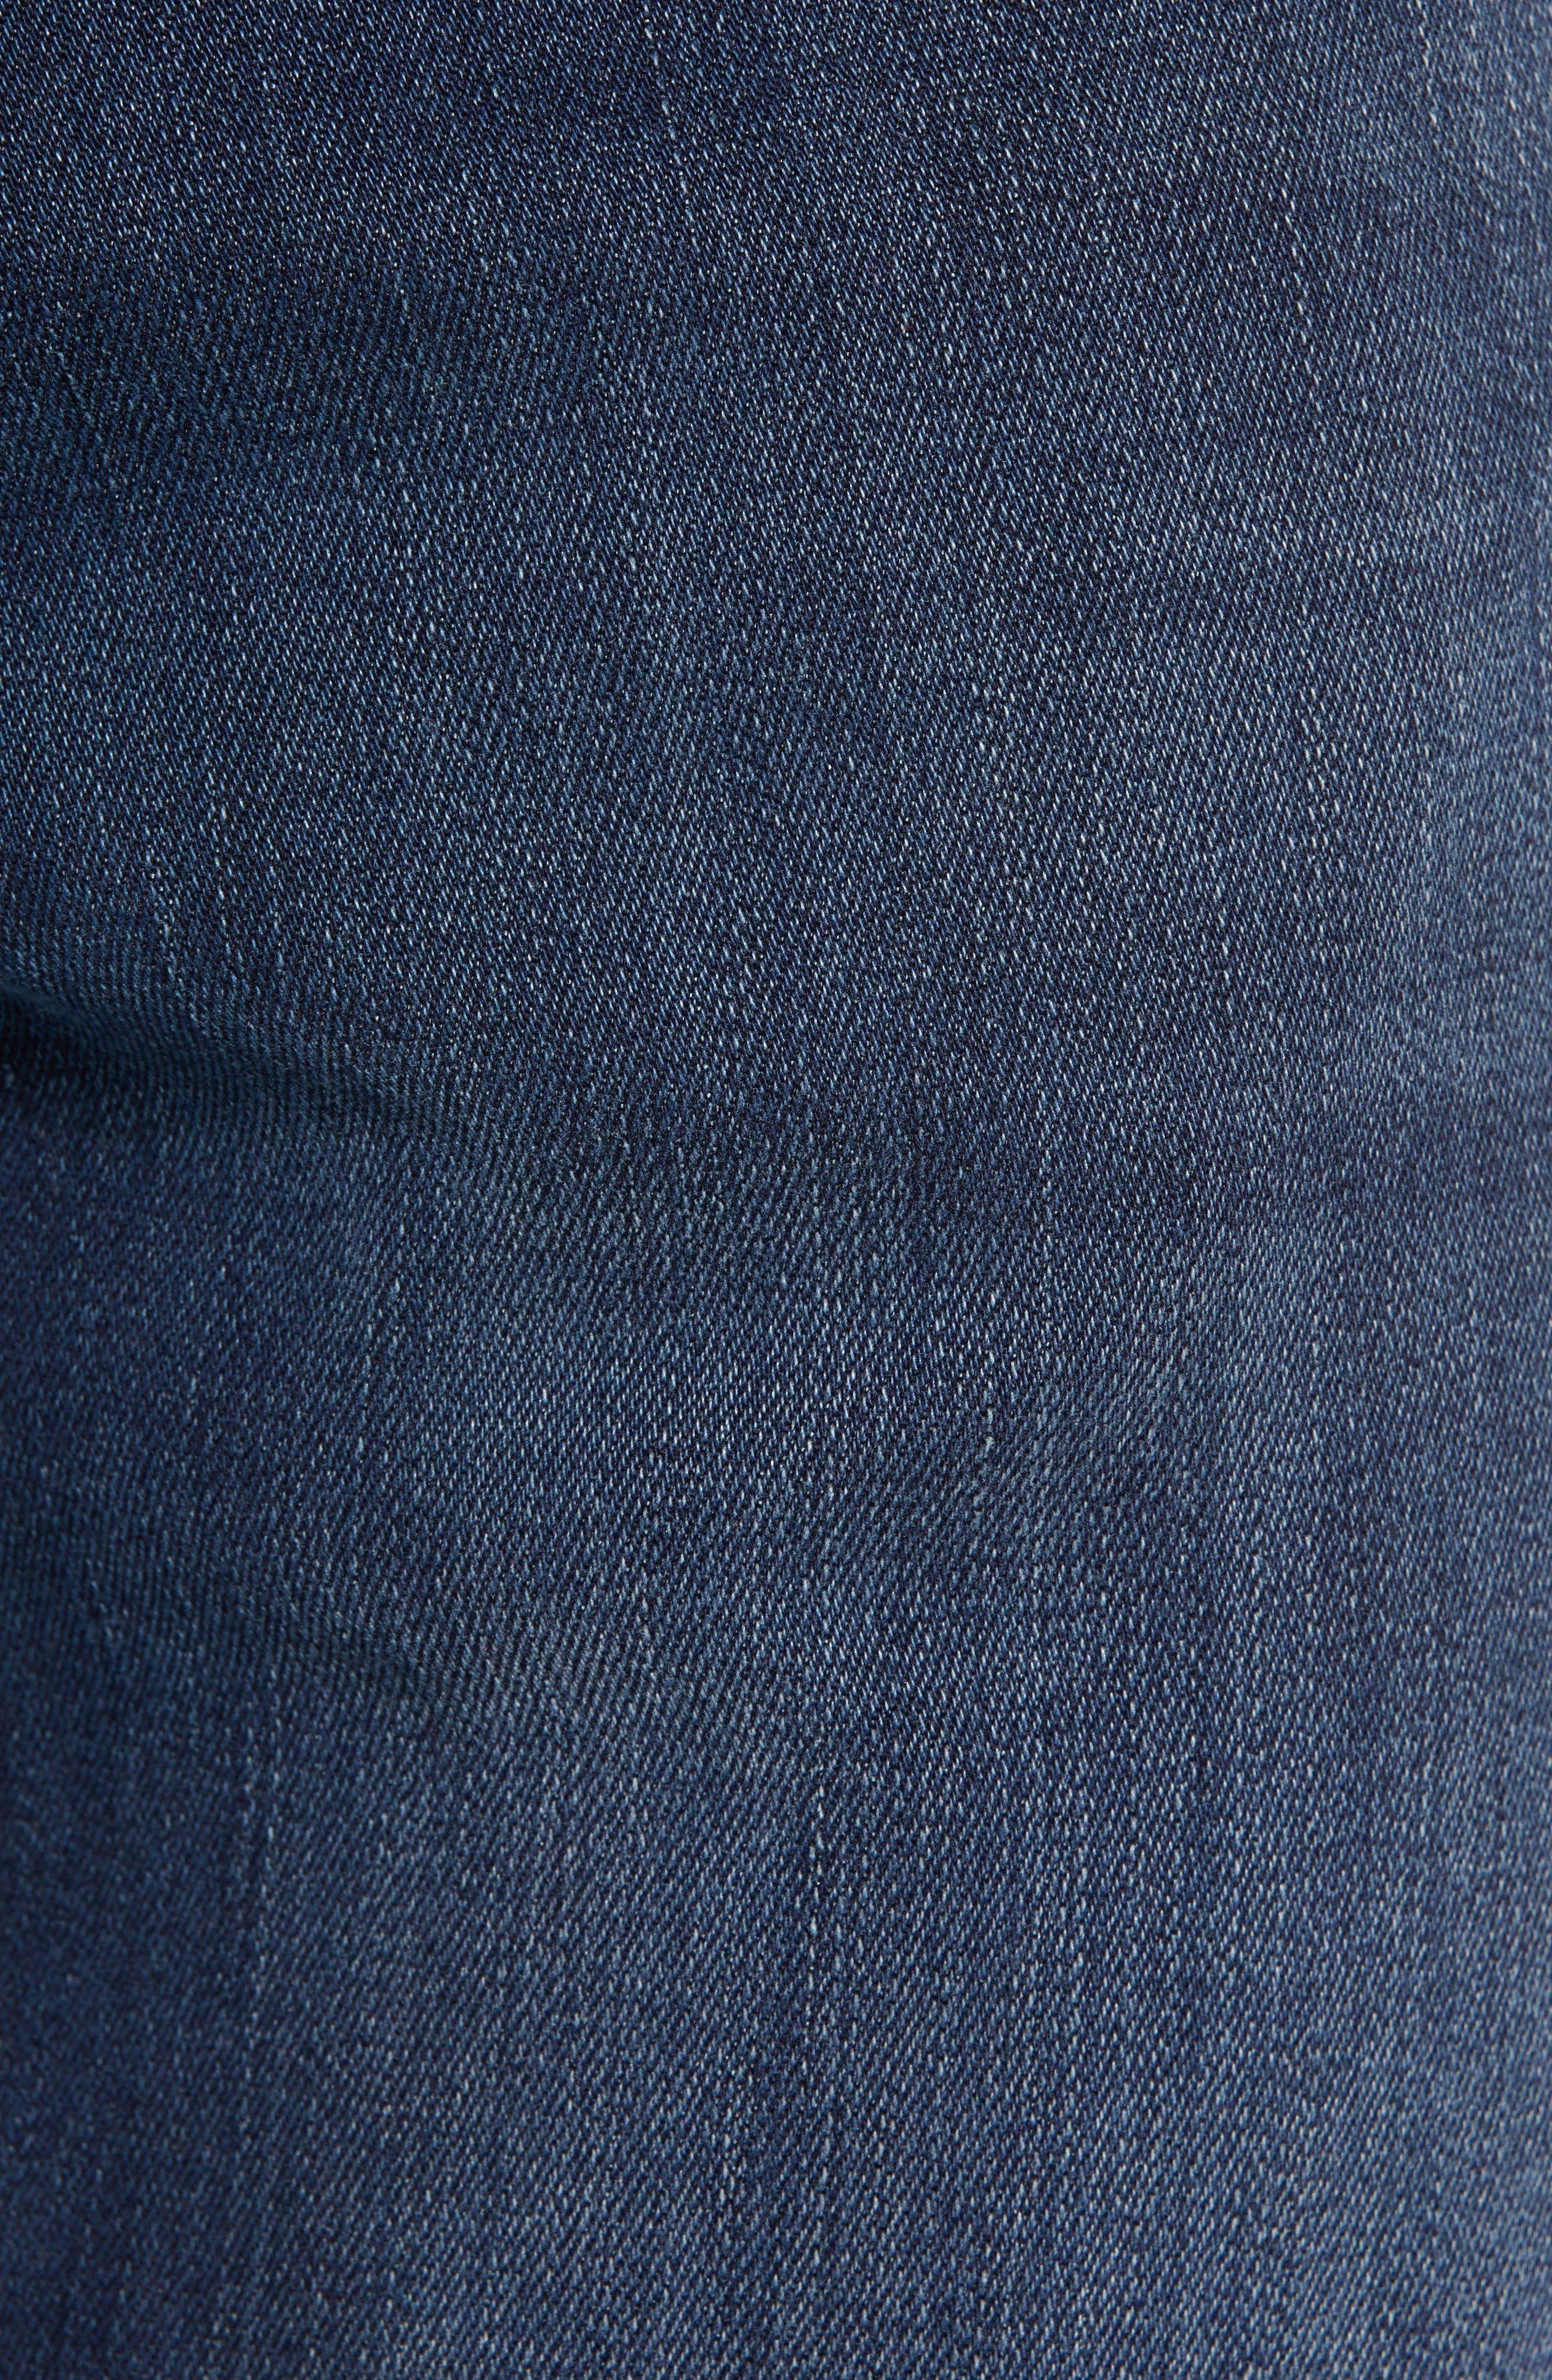 FIDELITY DENIM,                             Torino Slim Fit Jeans,                             Alternate thumbnail 5, color,                             SPECTRE